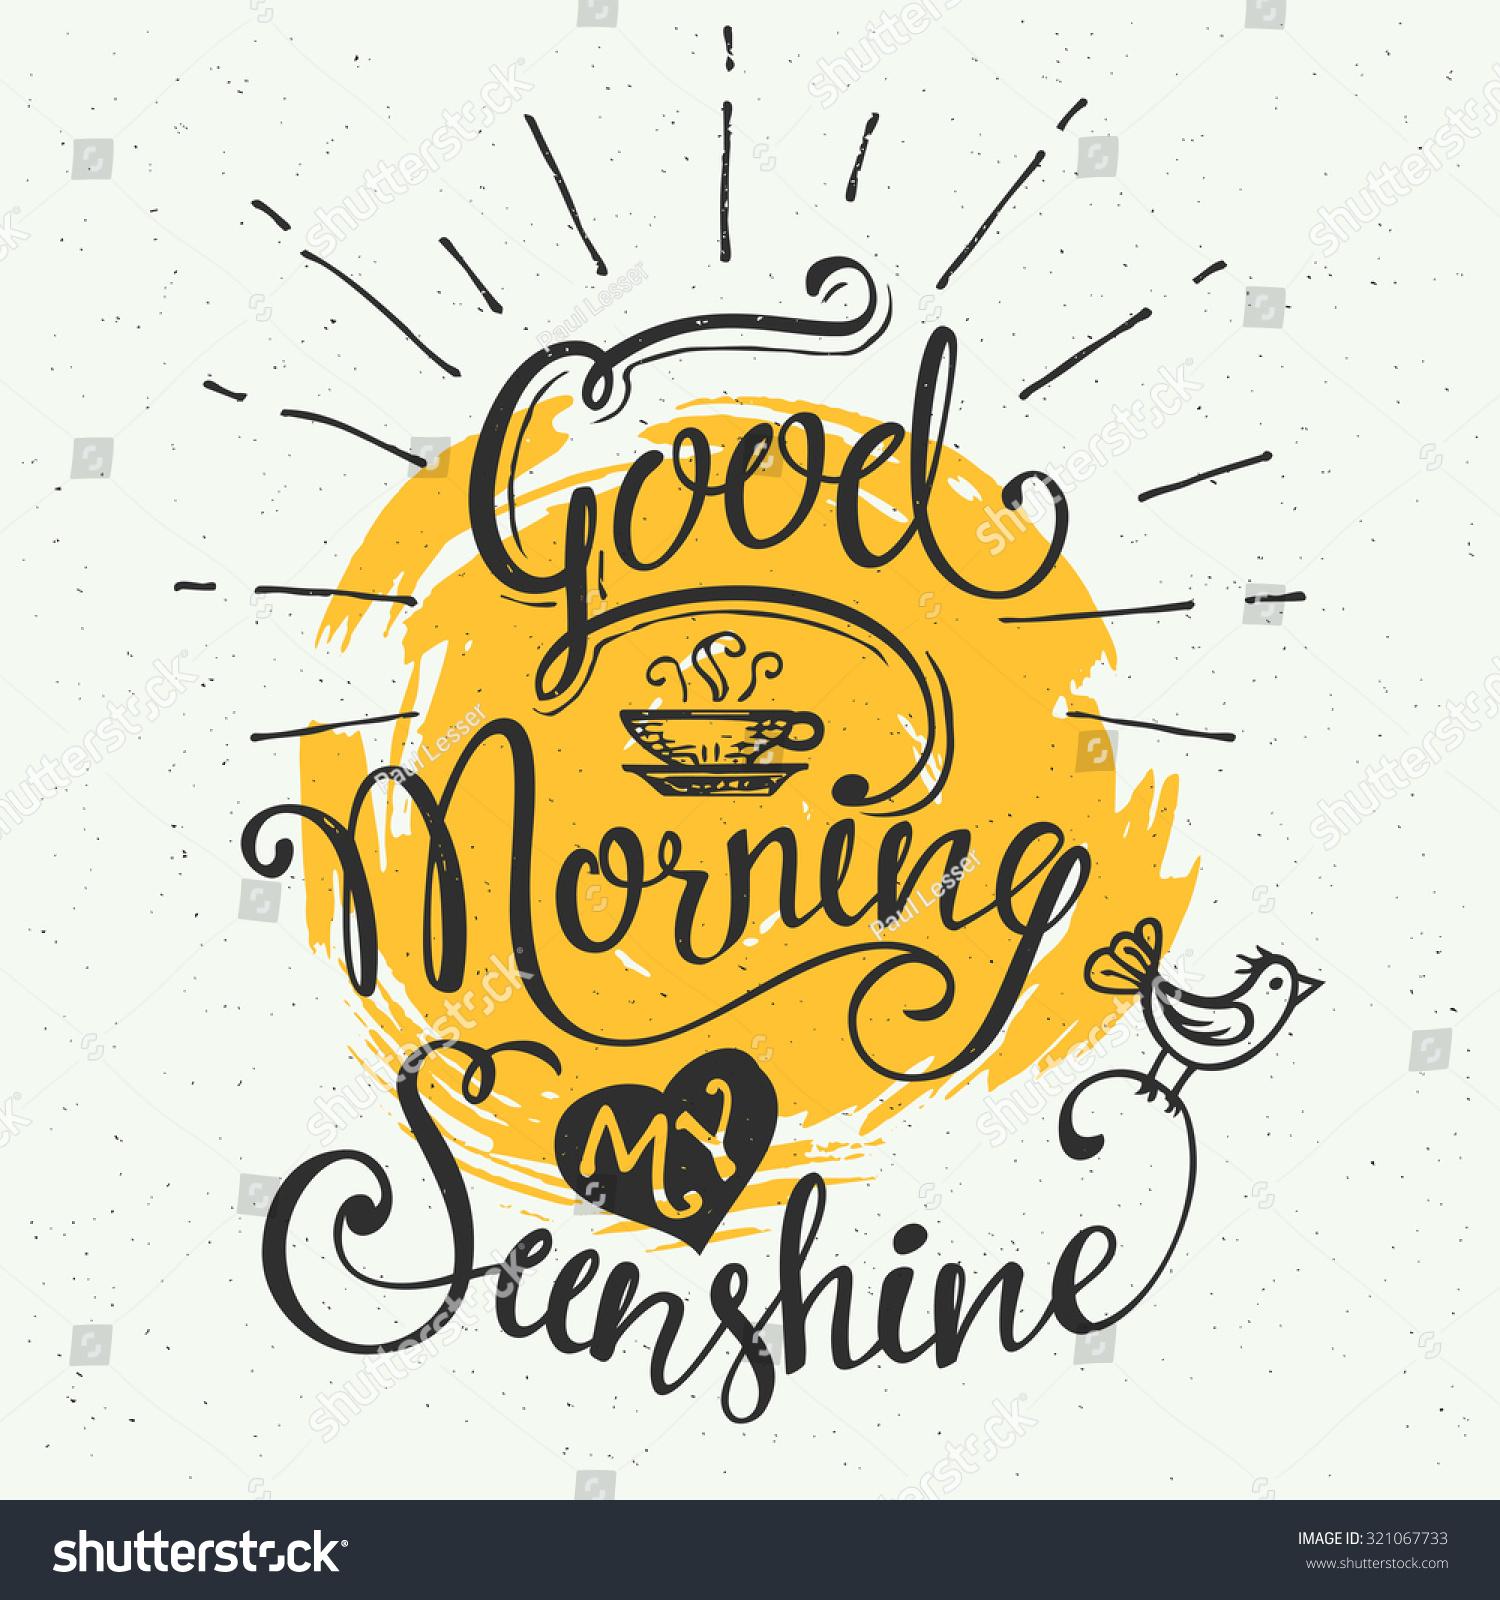 Good morning my sunshine hand drawn typographic design